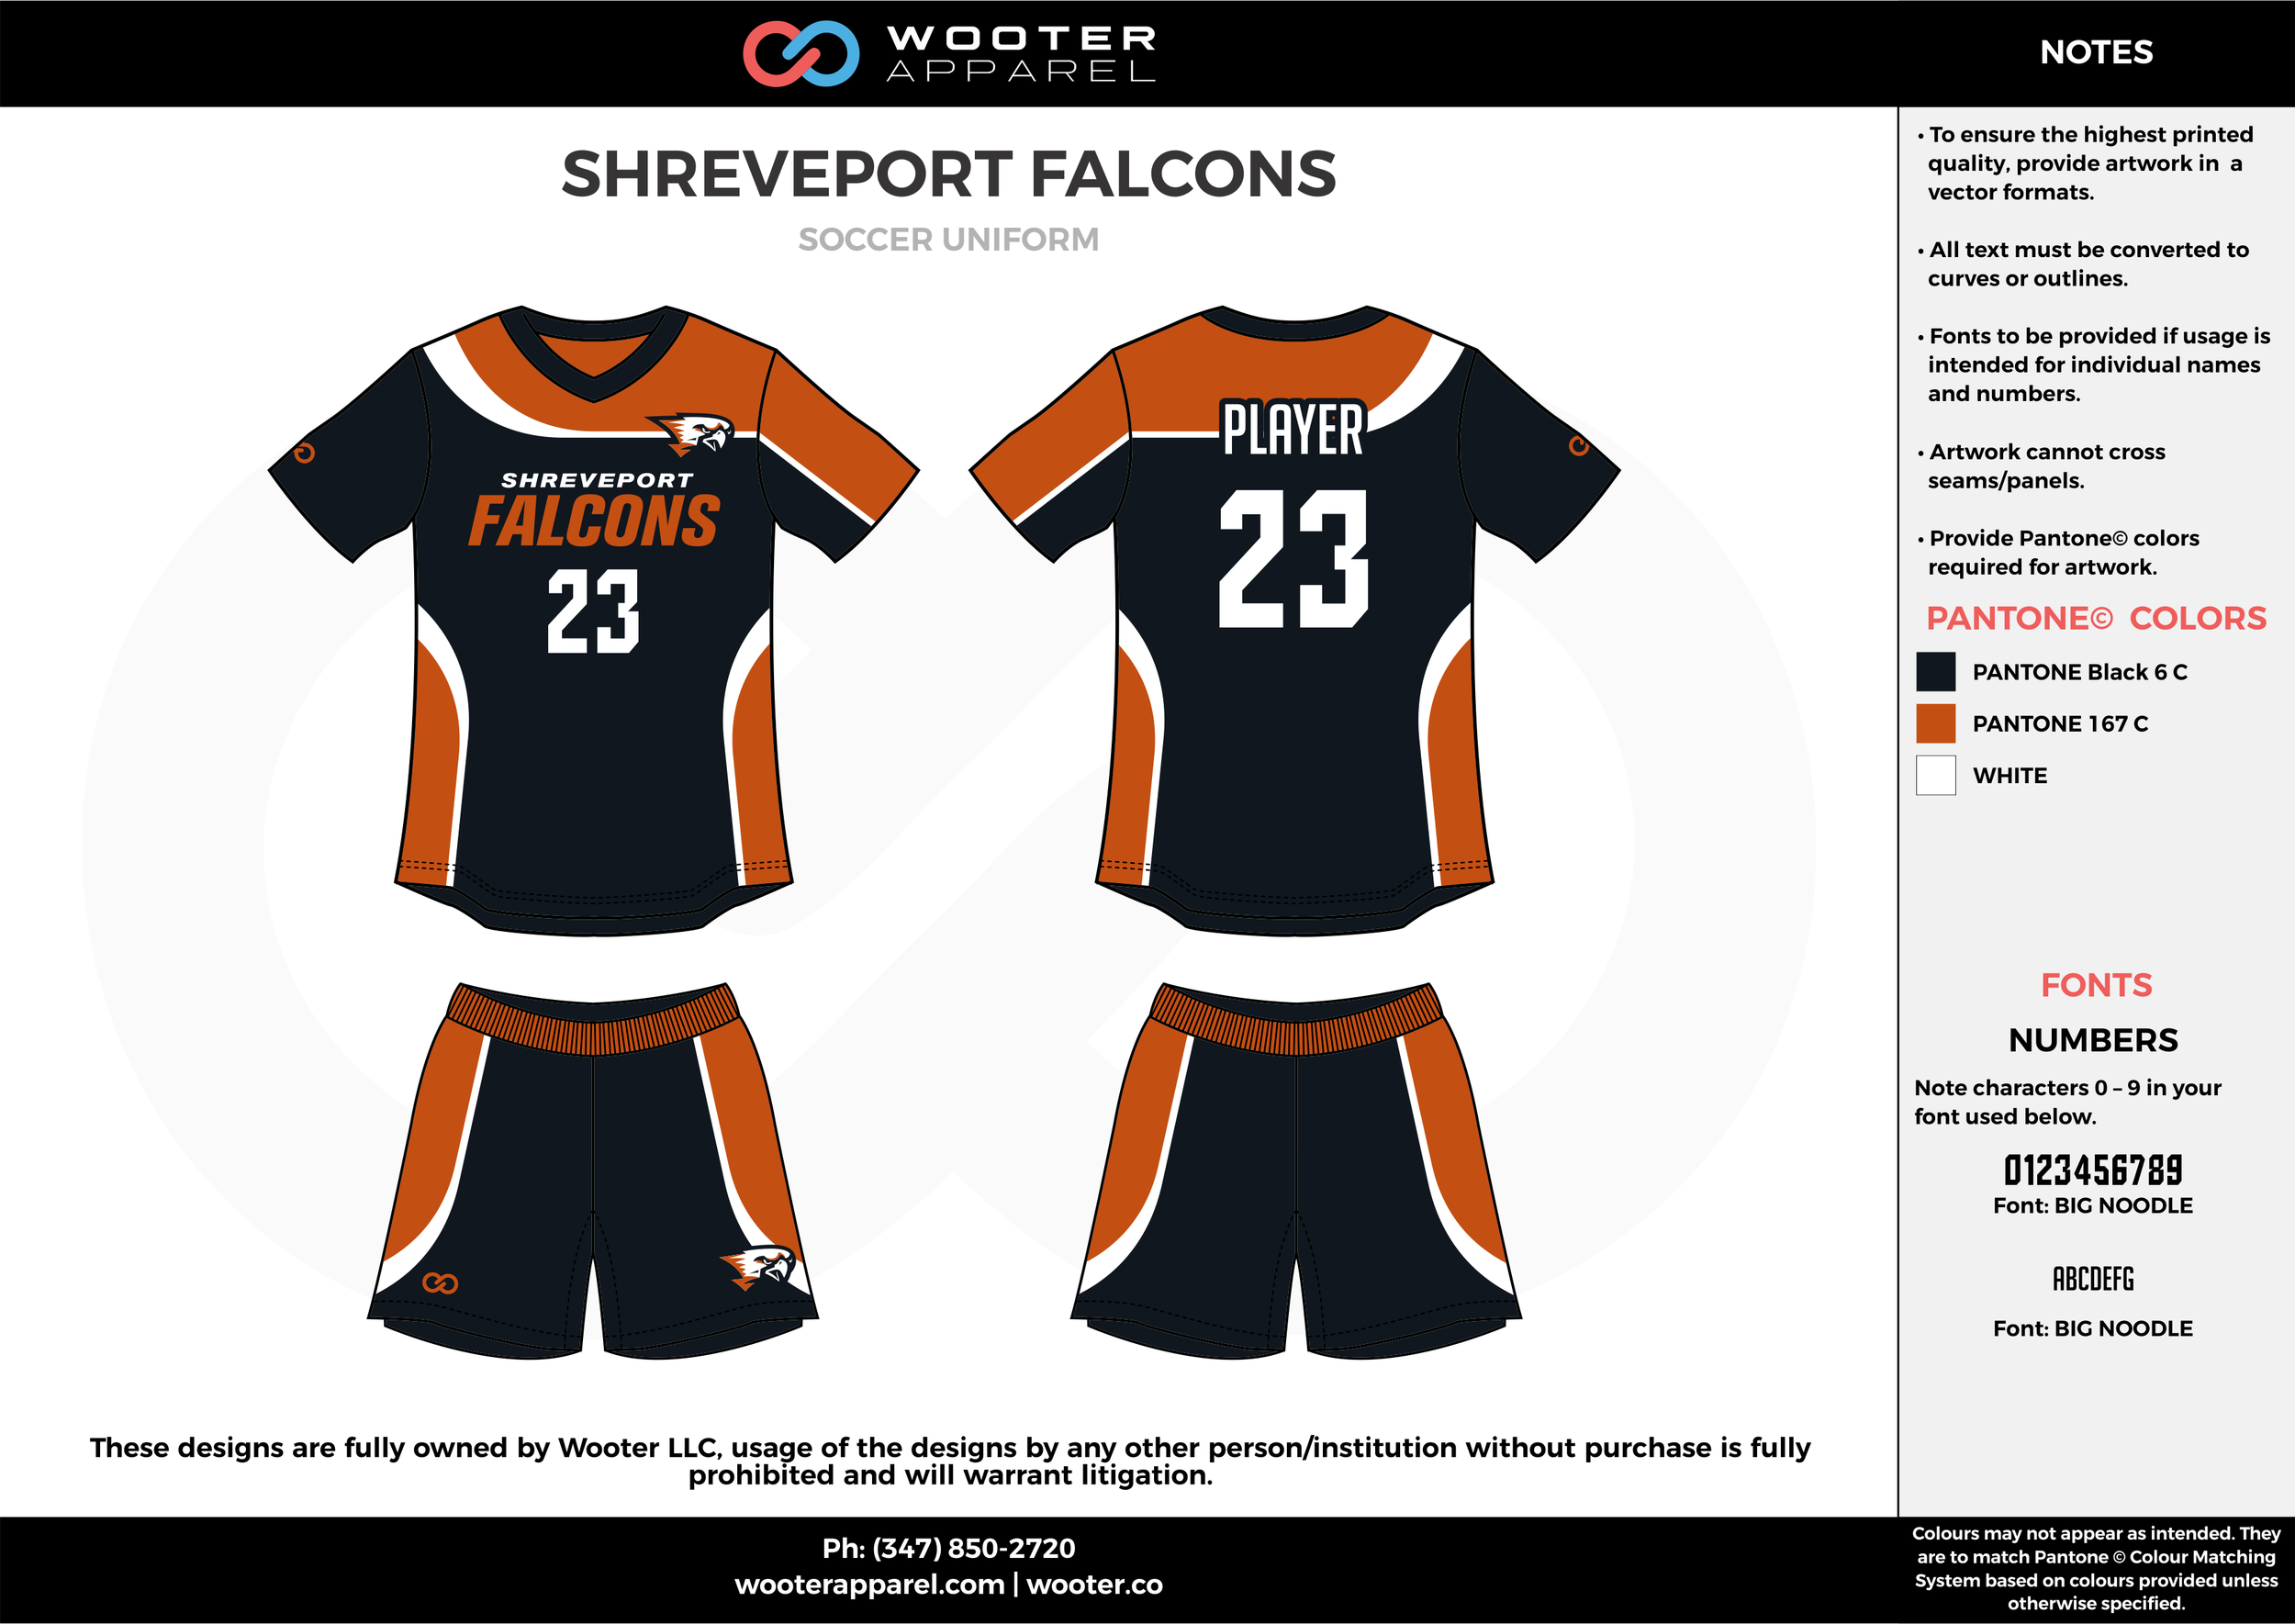 SHREVEPORT FALCONS black white brown custom sublimated soccer uniform jersey shirt shorts